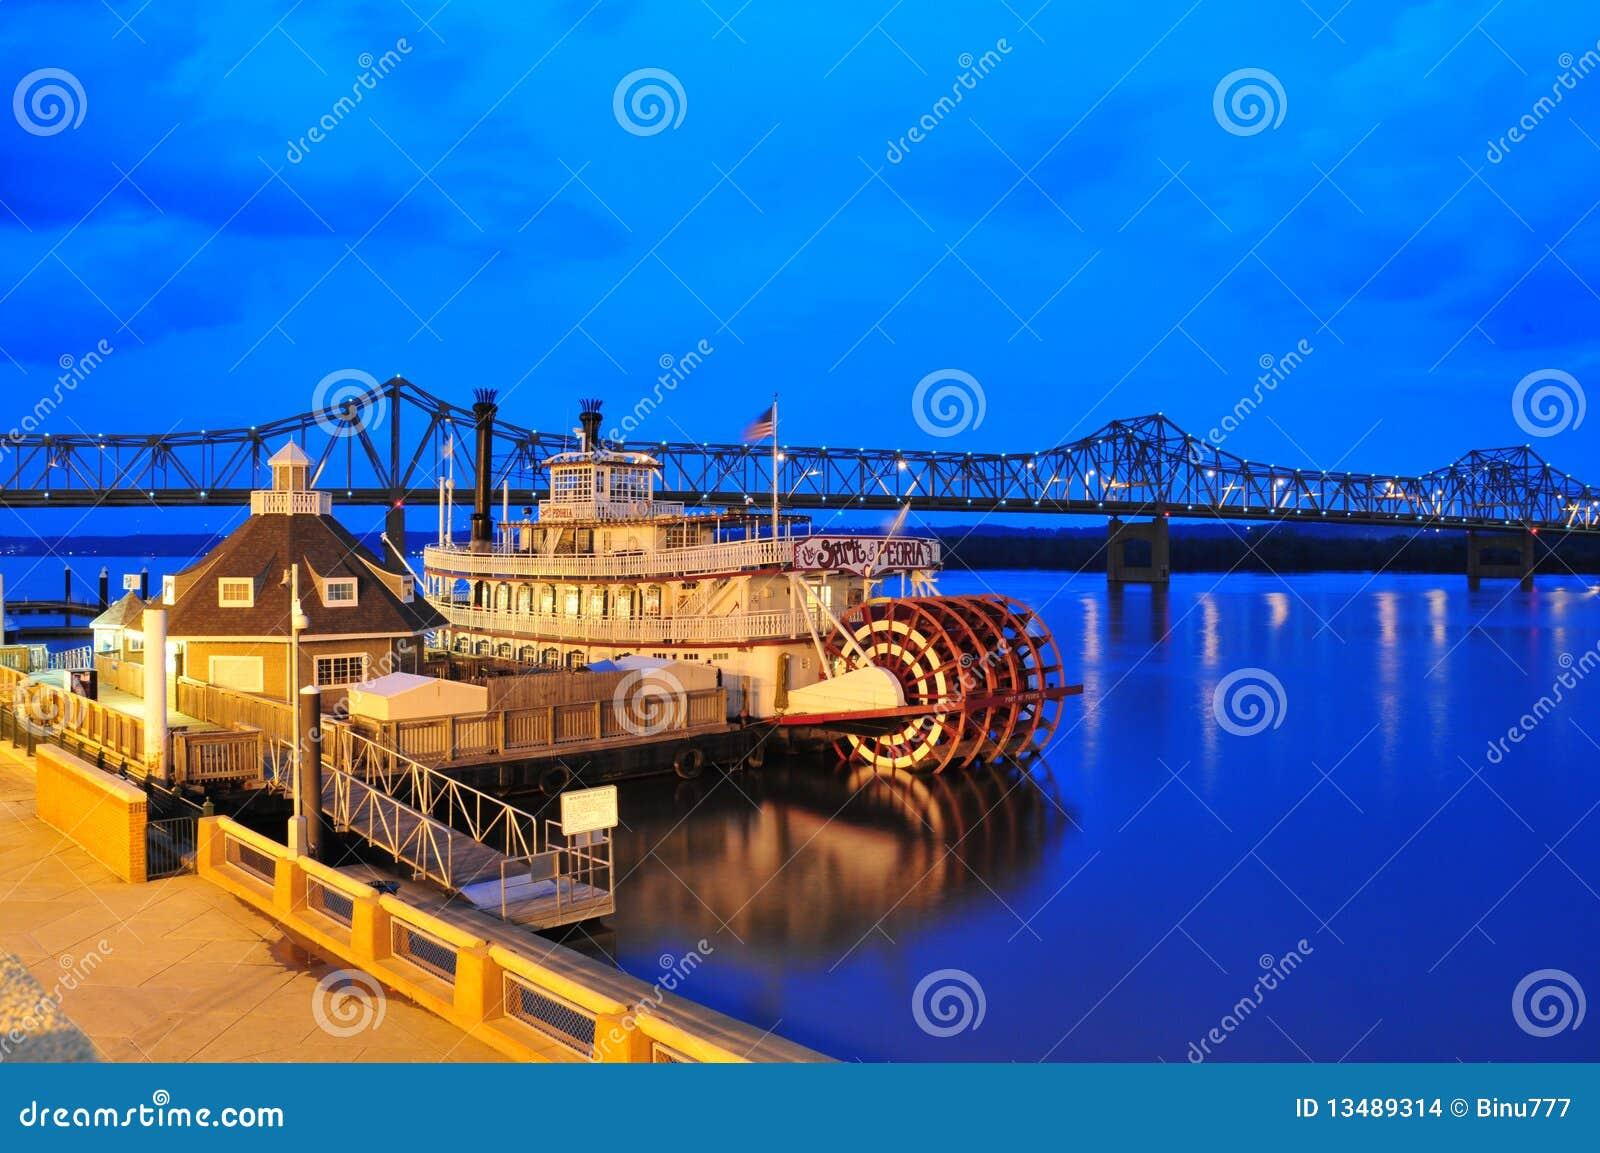 Peoria Riverfront - Stoomboot